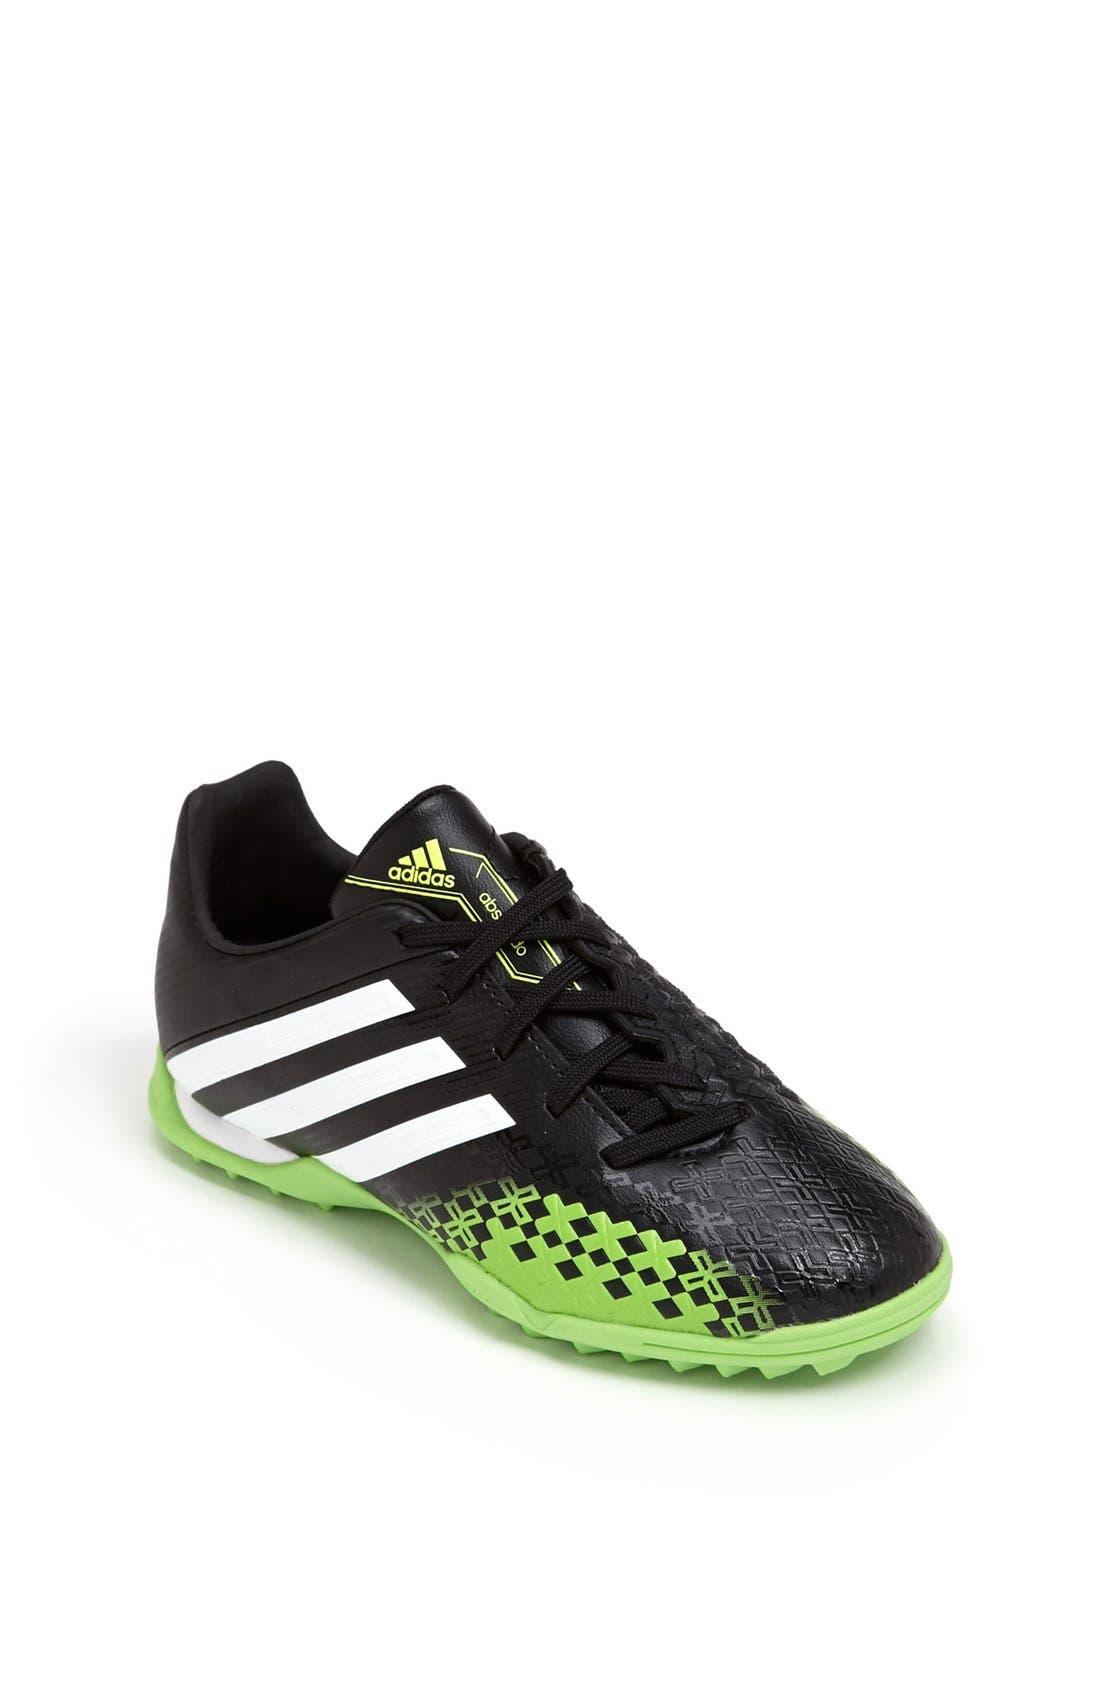 Main Image - adidas 'Predator Absolado LZ TRX TF' Soccer Shoe (Toddler, Little Kid & Big Kid)